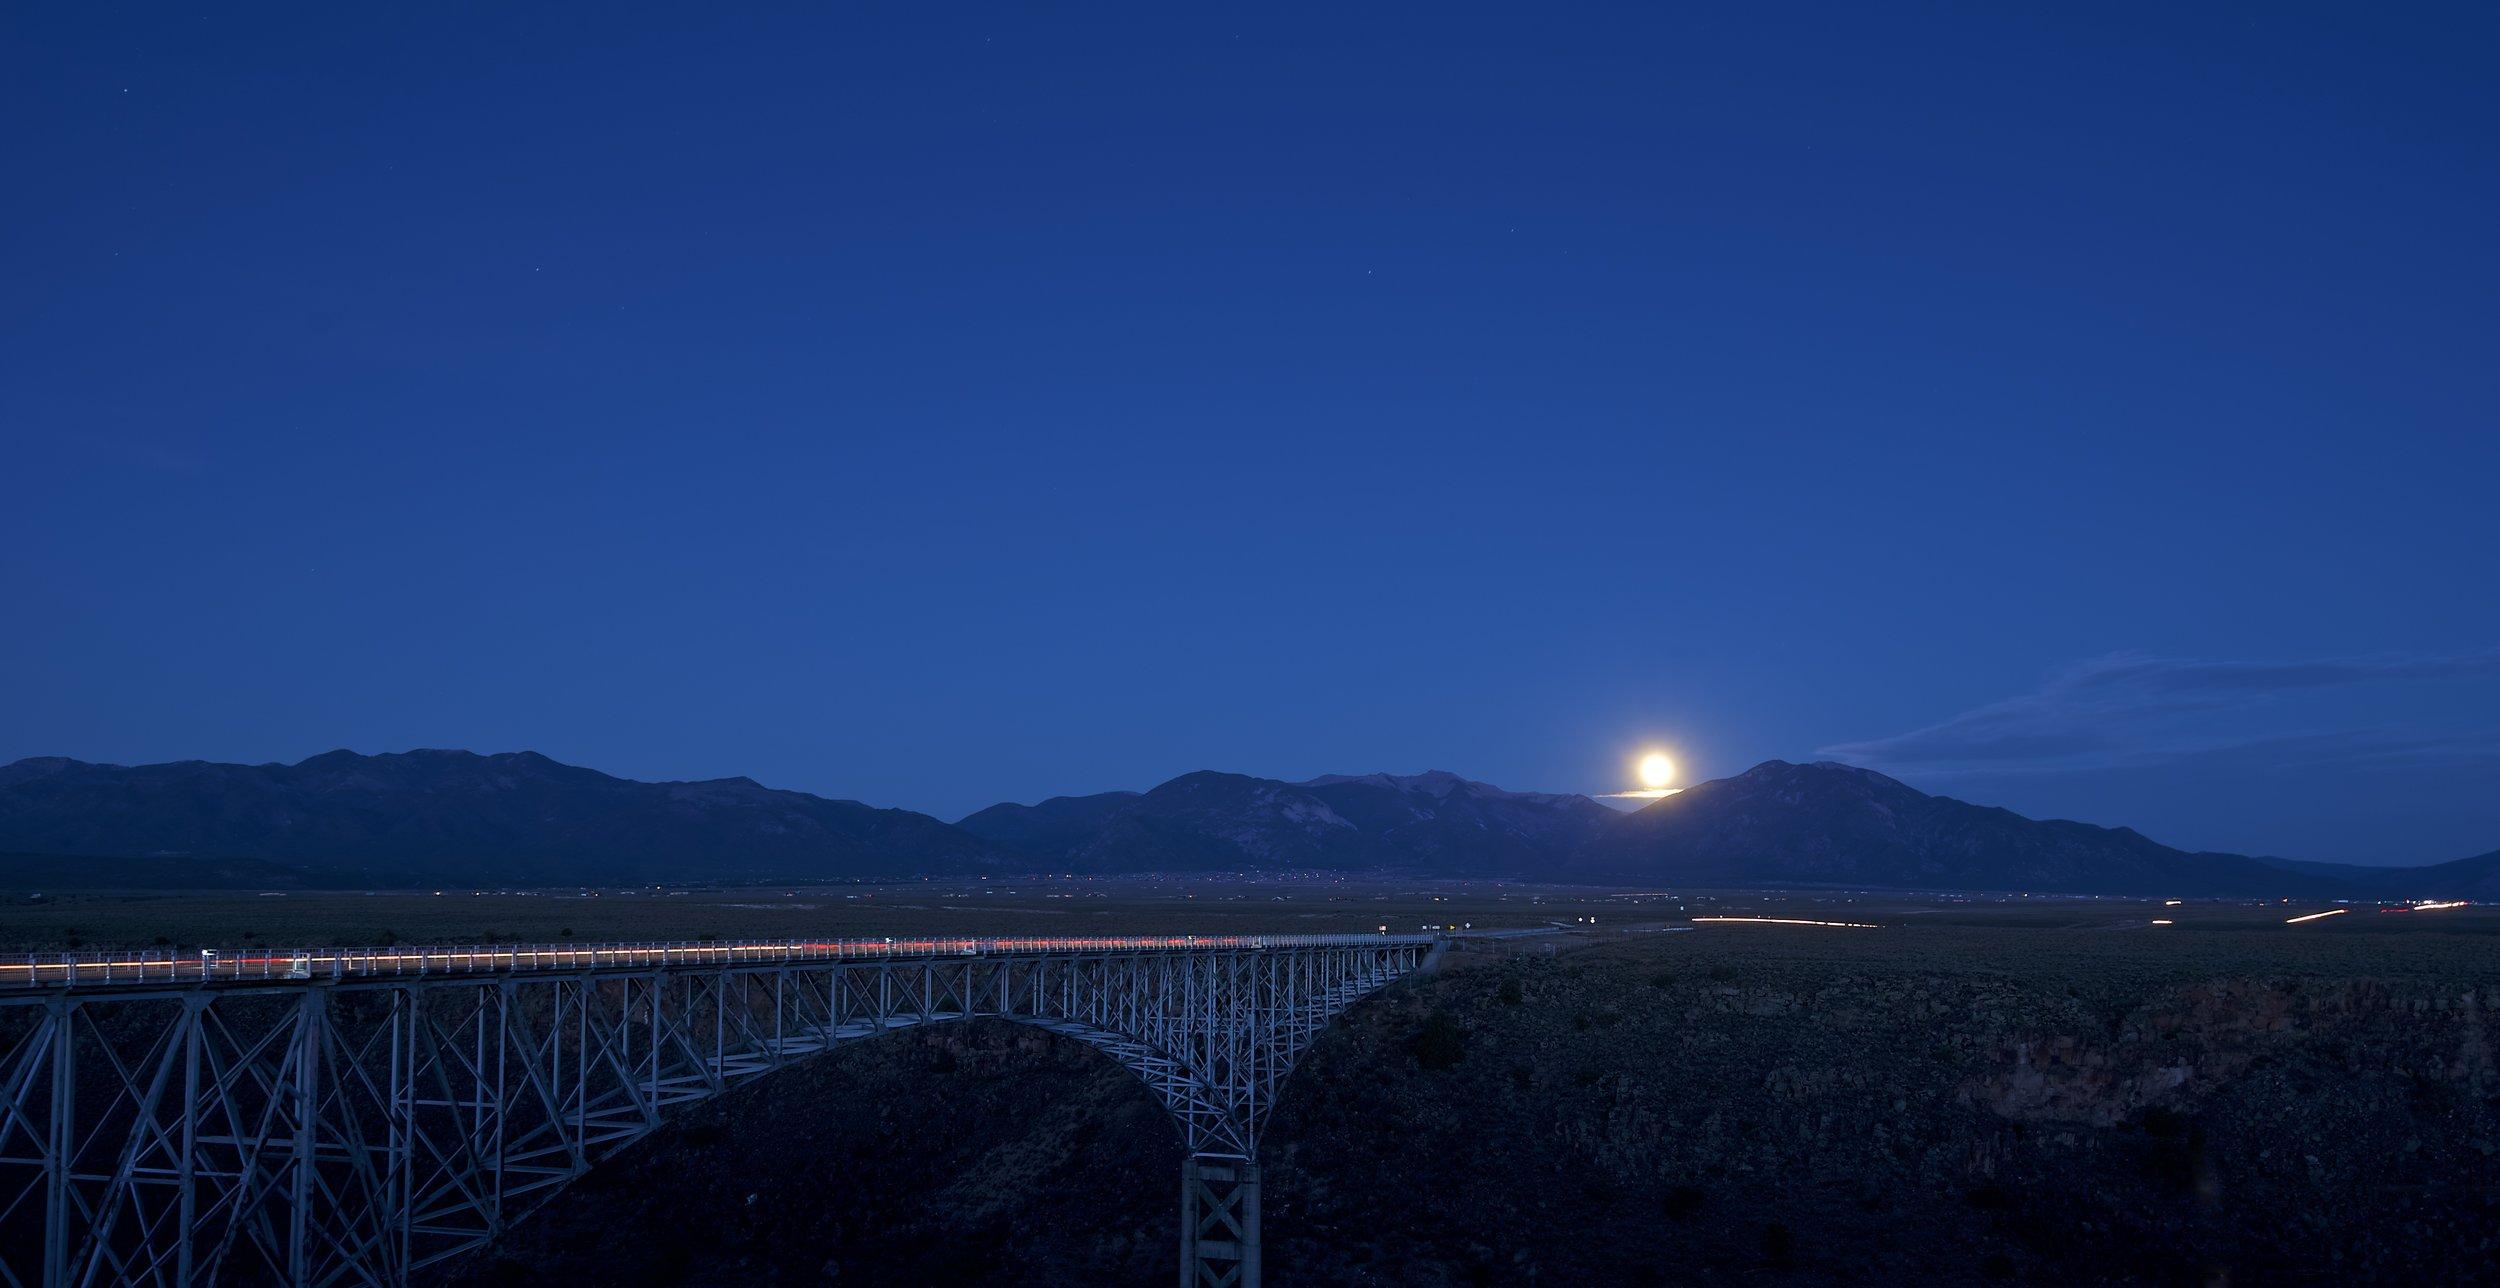 Rio Grande Gorge Bridge Moon Rise